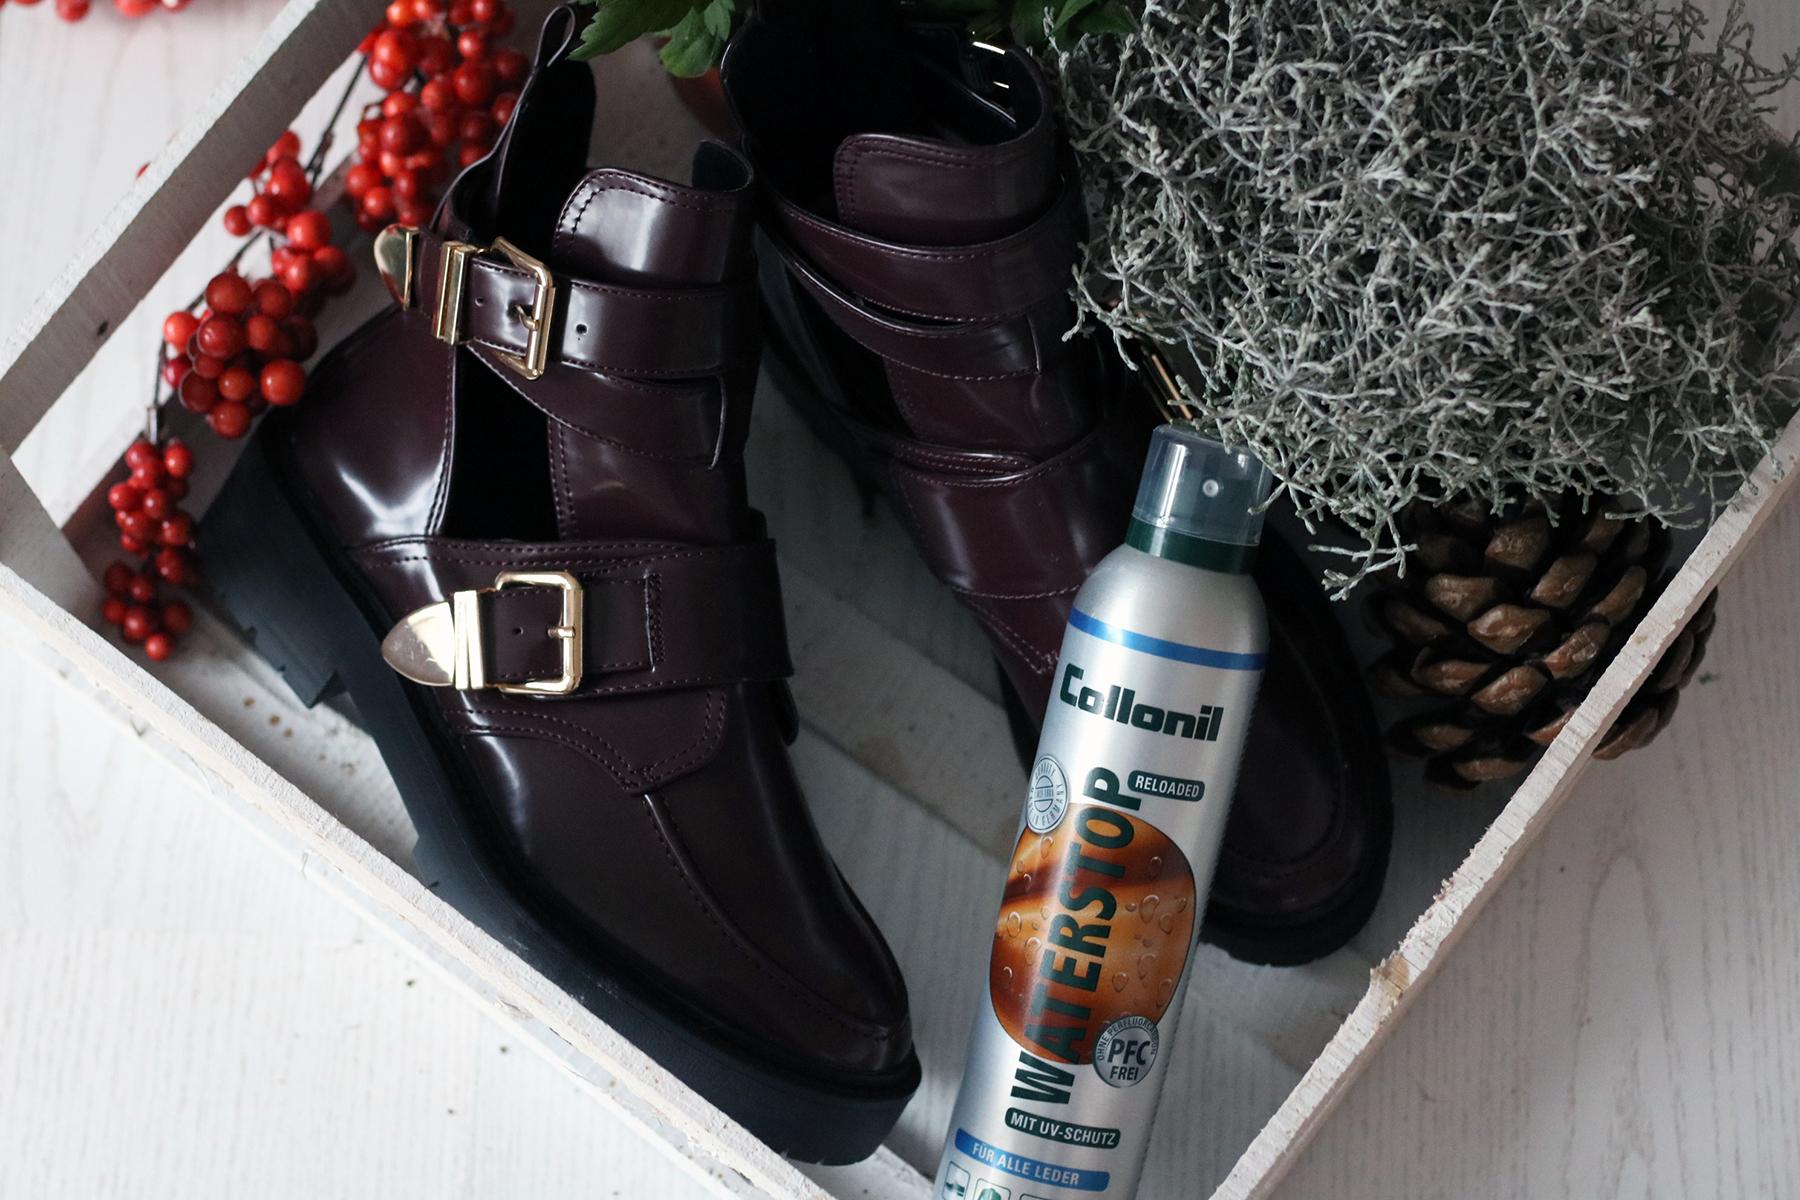 collonil-schuhe-boots-herbst-winter-liebste-modeblog-pflege5